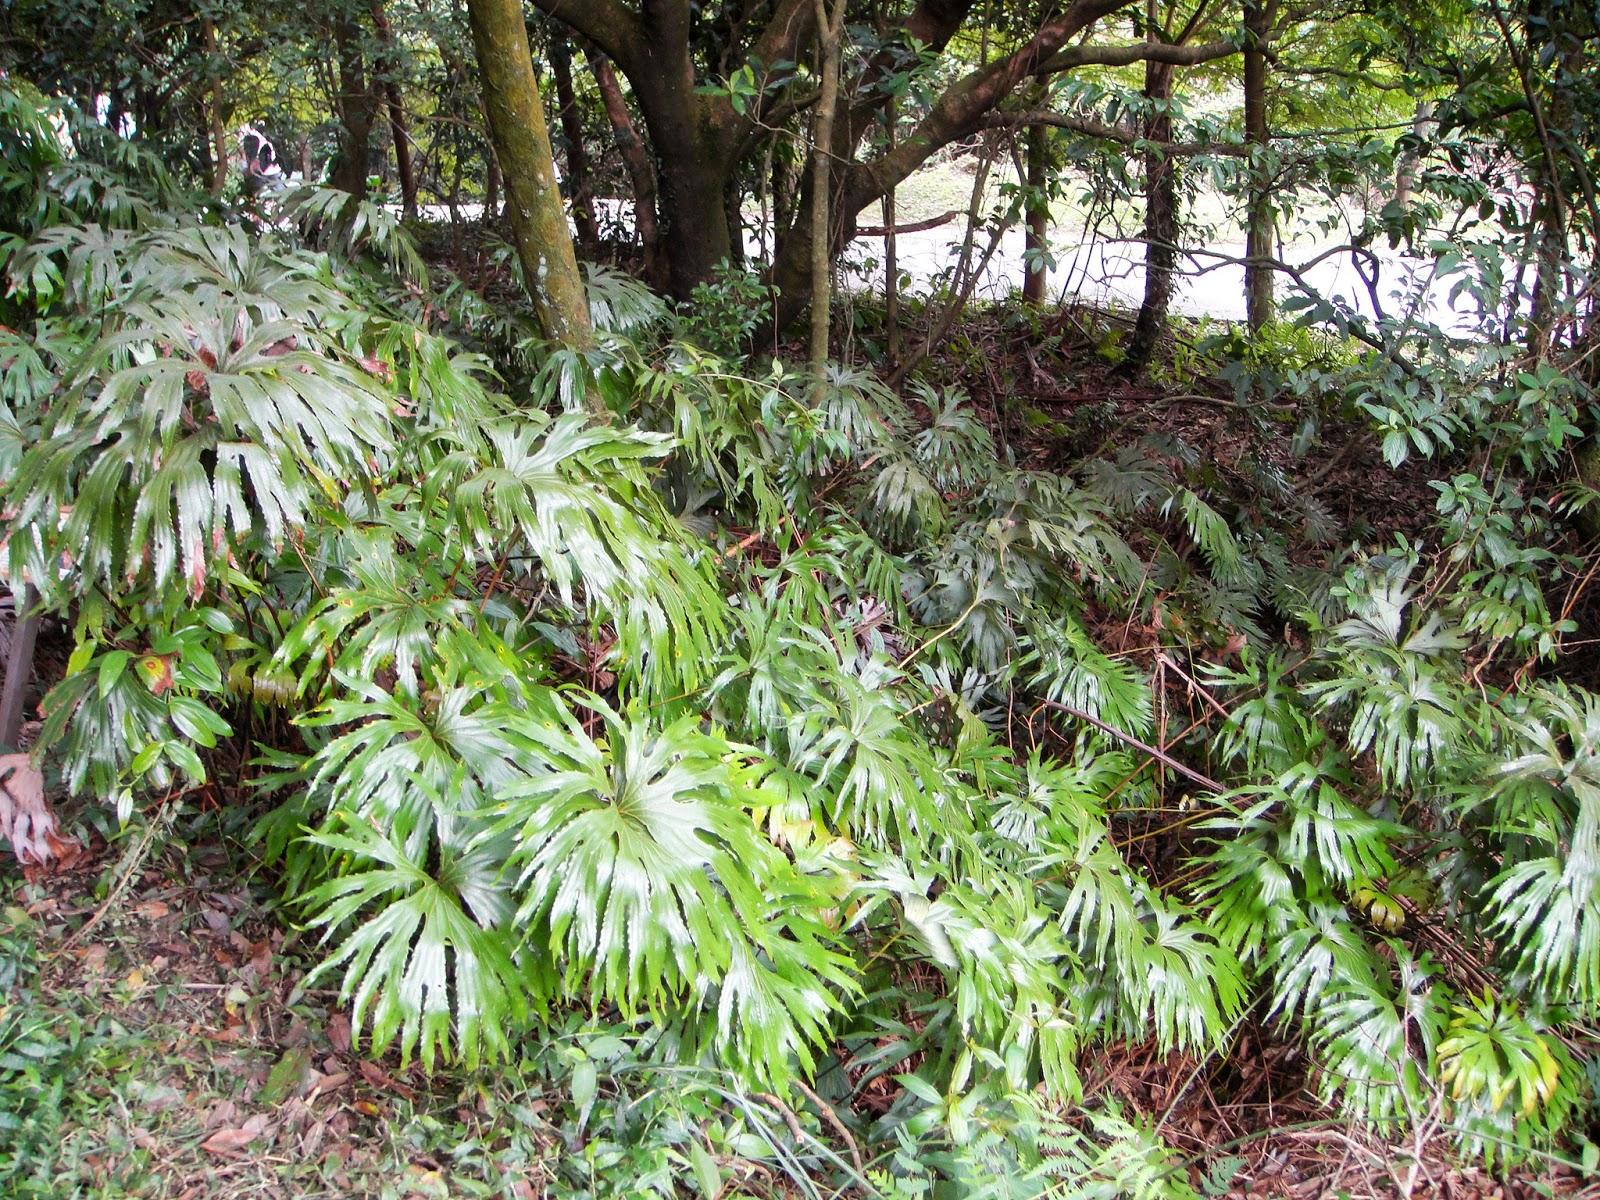 DWAN雲之端: 雙扇蕨--屬於雙扇蕨科,濕熱,故名。學名:. Dipteris conjugata Reinw. ;英文名 ...